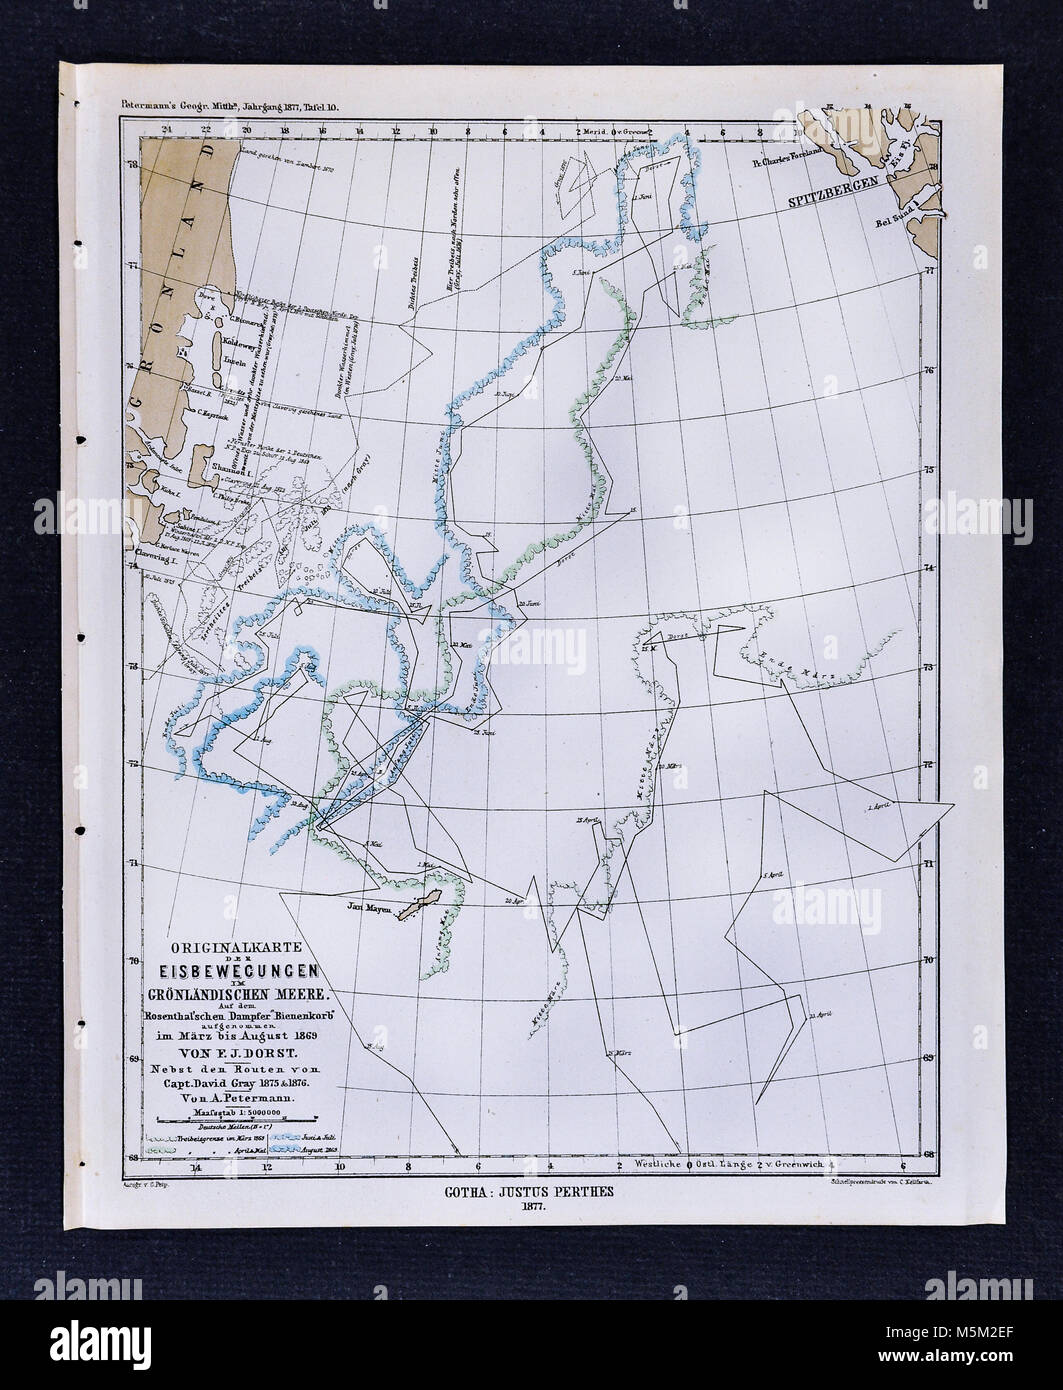 1877 - Carte Mittheilungen Petermann icebergs du Groenland Photo Stock